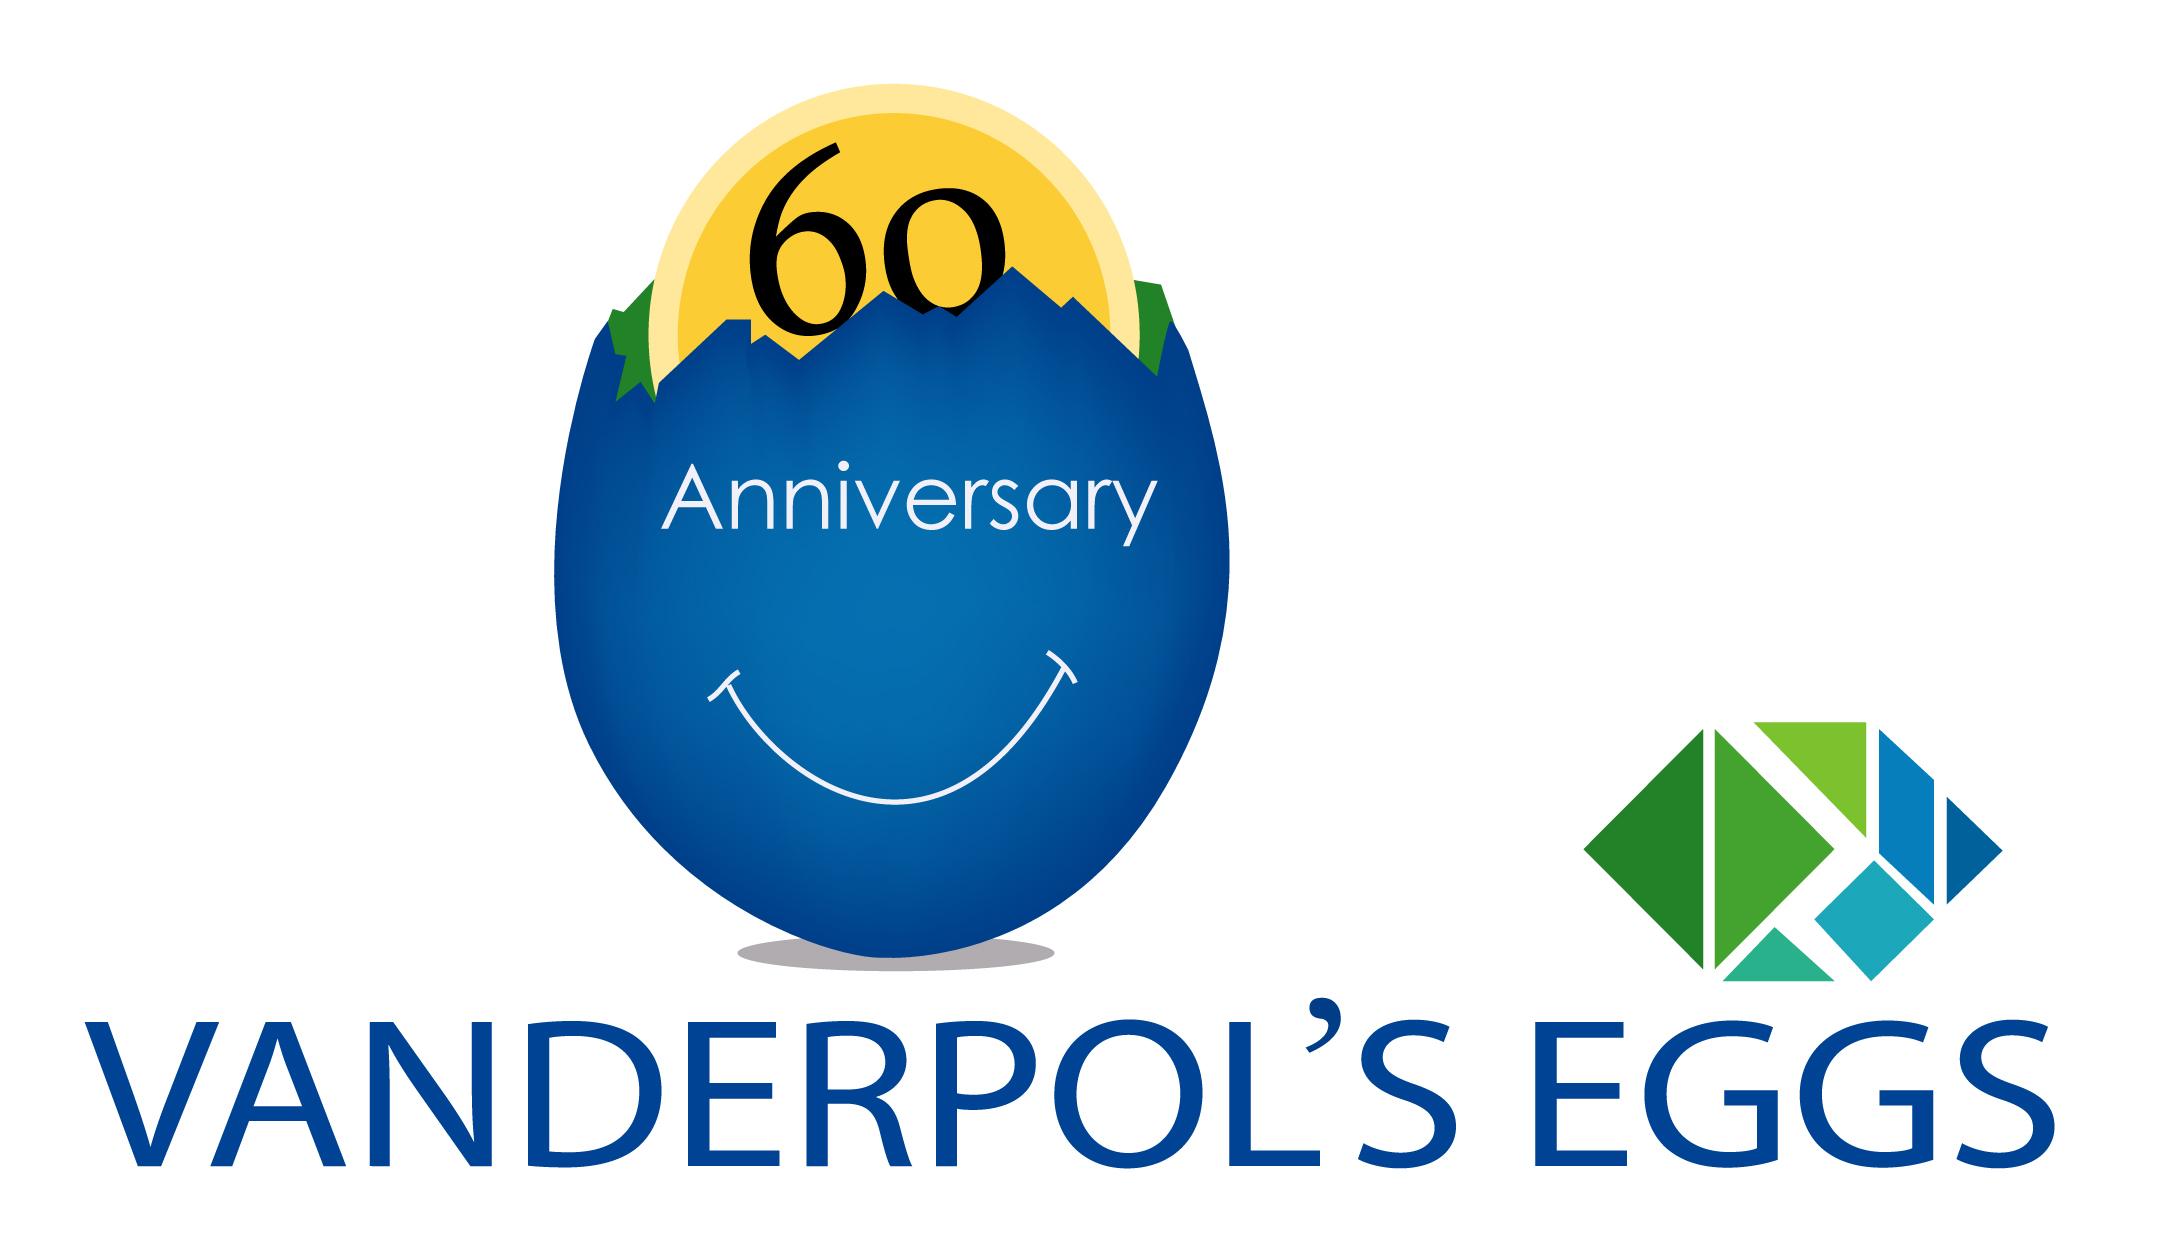 Logo Design by V Anil Yadavv - Entry No. 28 in the Logo Design Contest Unique Logo Design Wanted for Vanderpols Eggs Ltd.